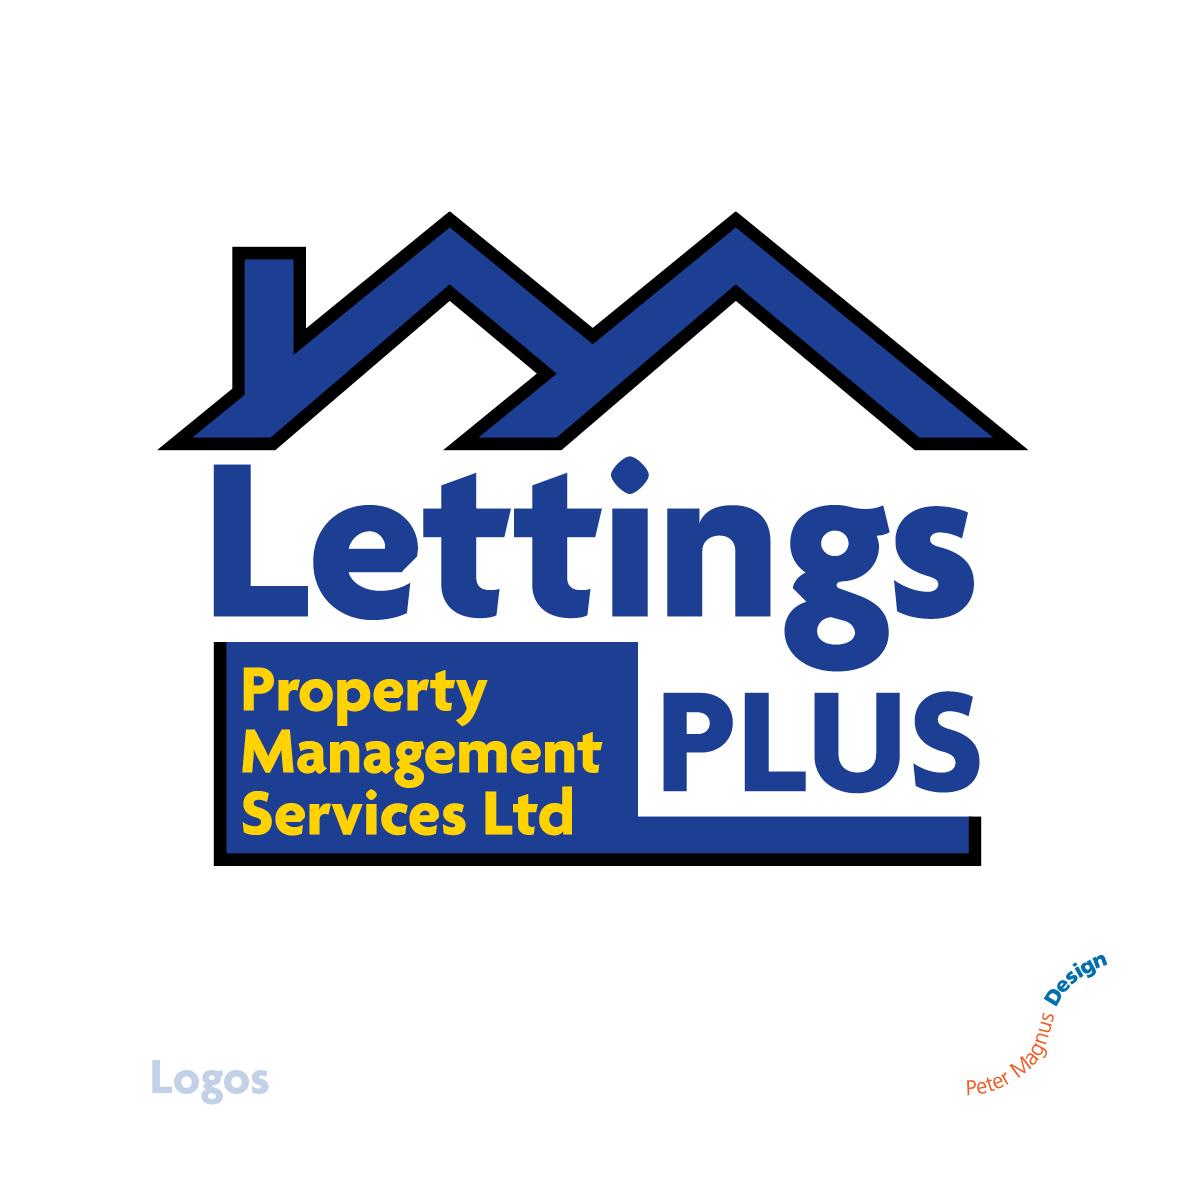 Lettings Plus logo, Property Management Services Ltd, Watford